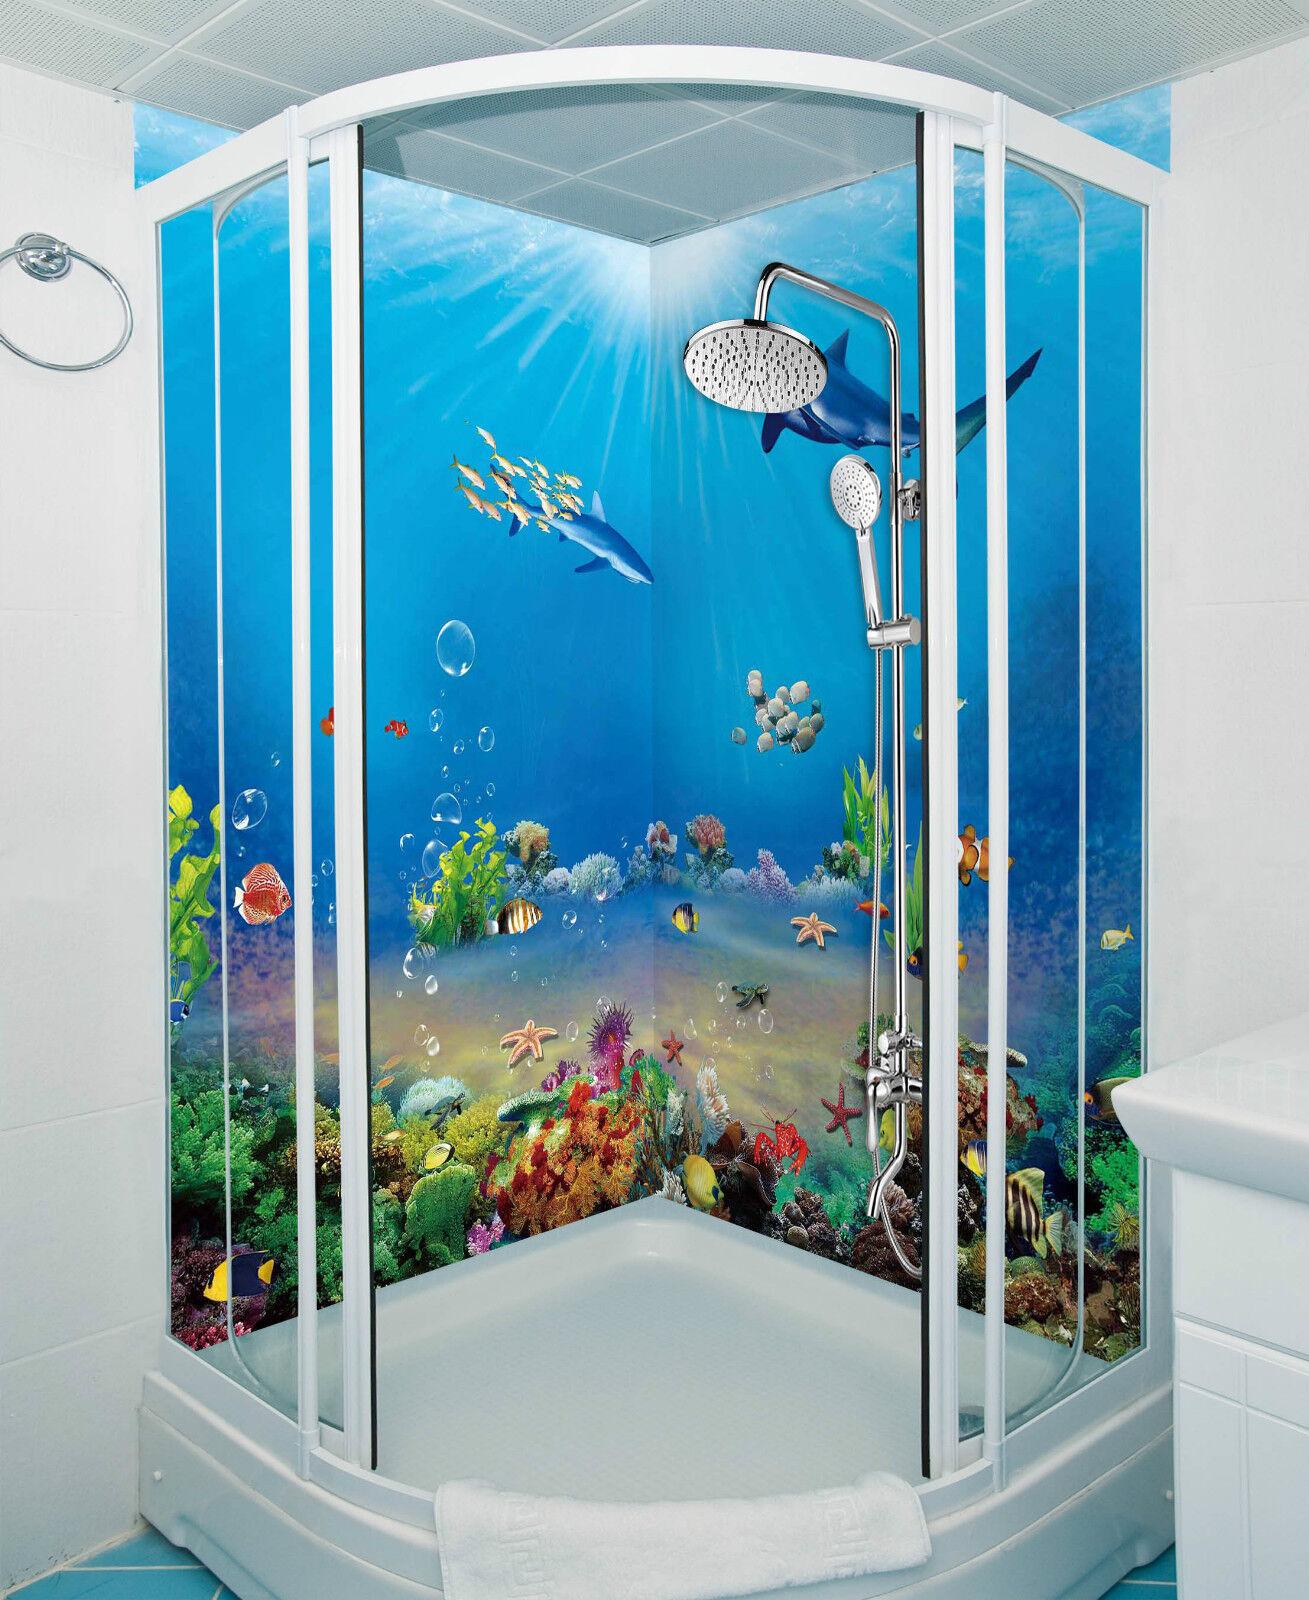 3D bluee Ocean World 092 WallPaper Bathroom Print Decal Wall Deco AJ WALLPAPER CA